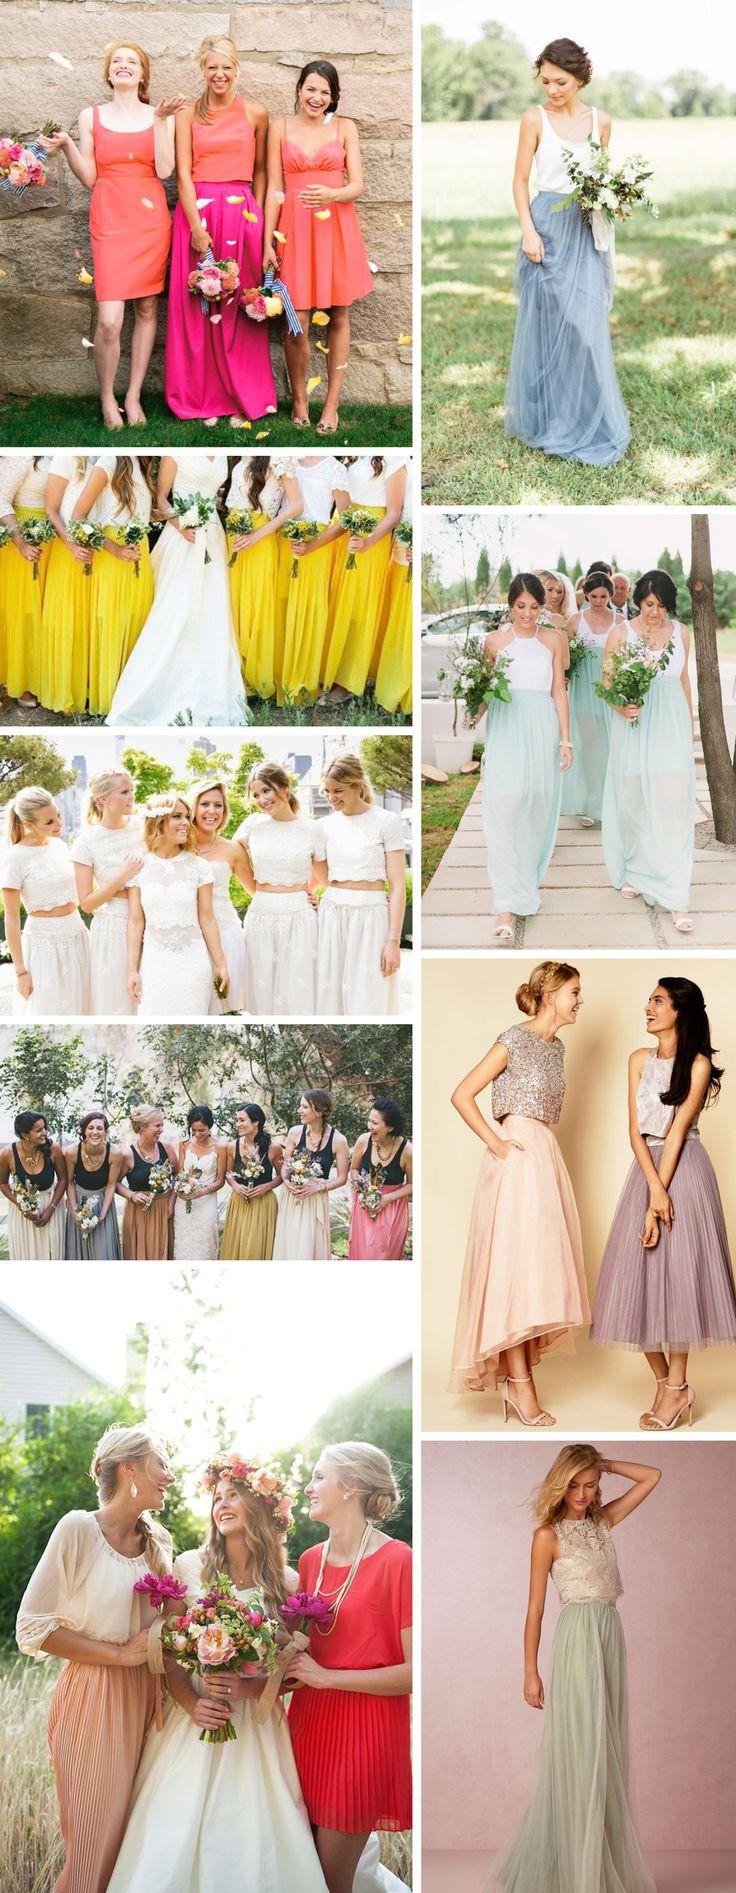 Cute Skirt Bridesmaid Dresses Your Girls Are Sure To Love! http://www.beaconln.com/blog/